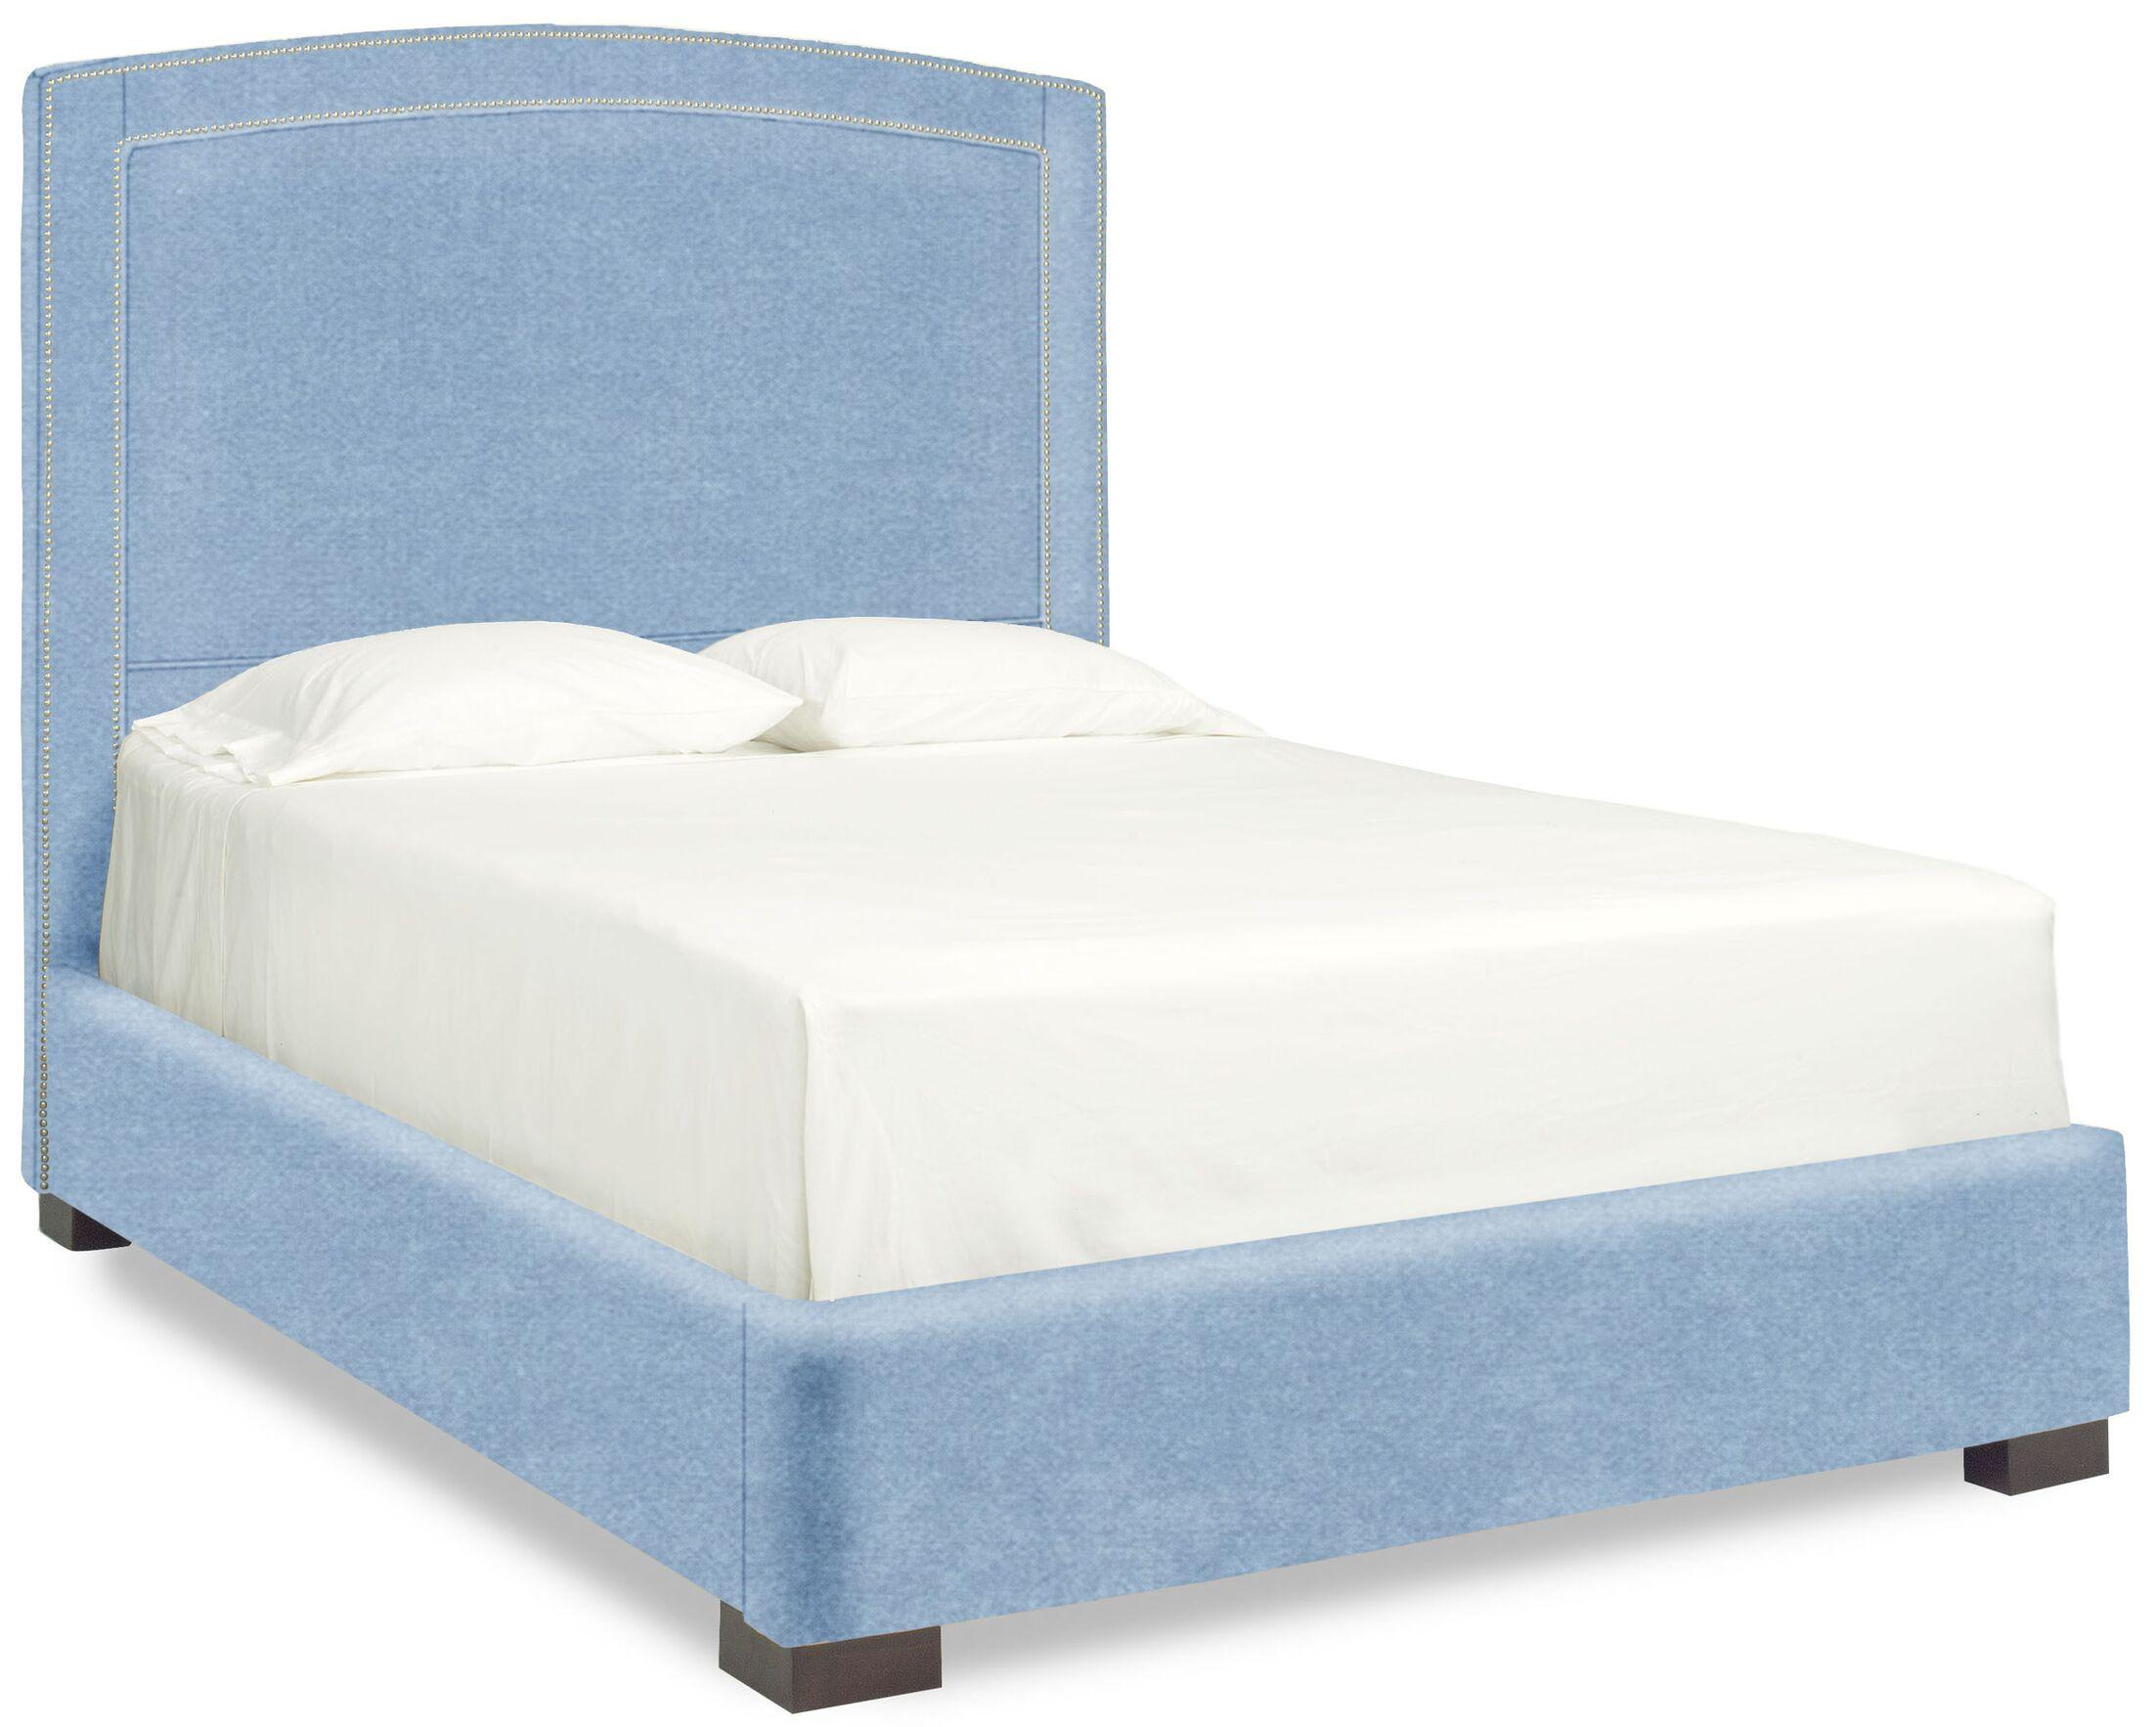 Dreamtime Upholstered Panel Bed Size: Full, Color: Sky